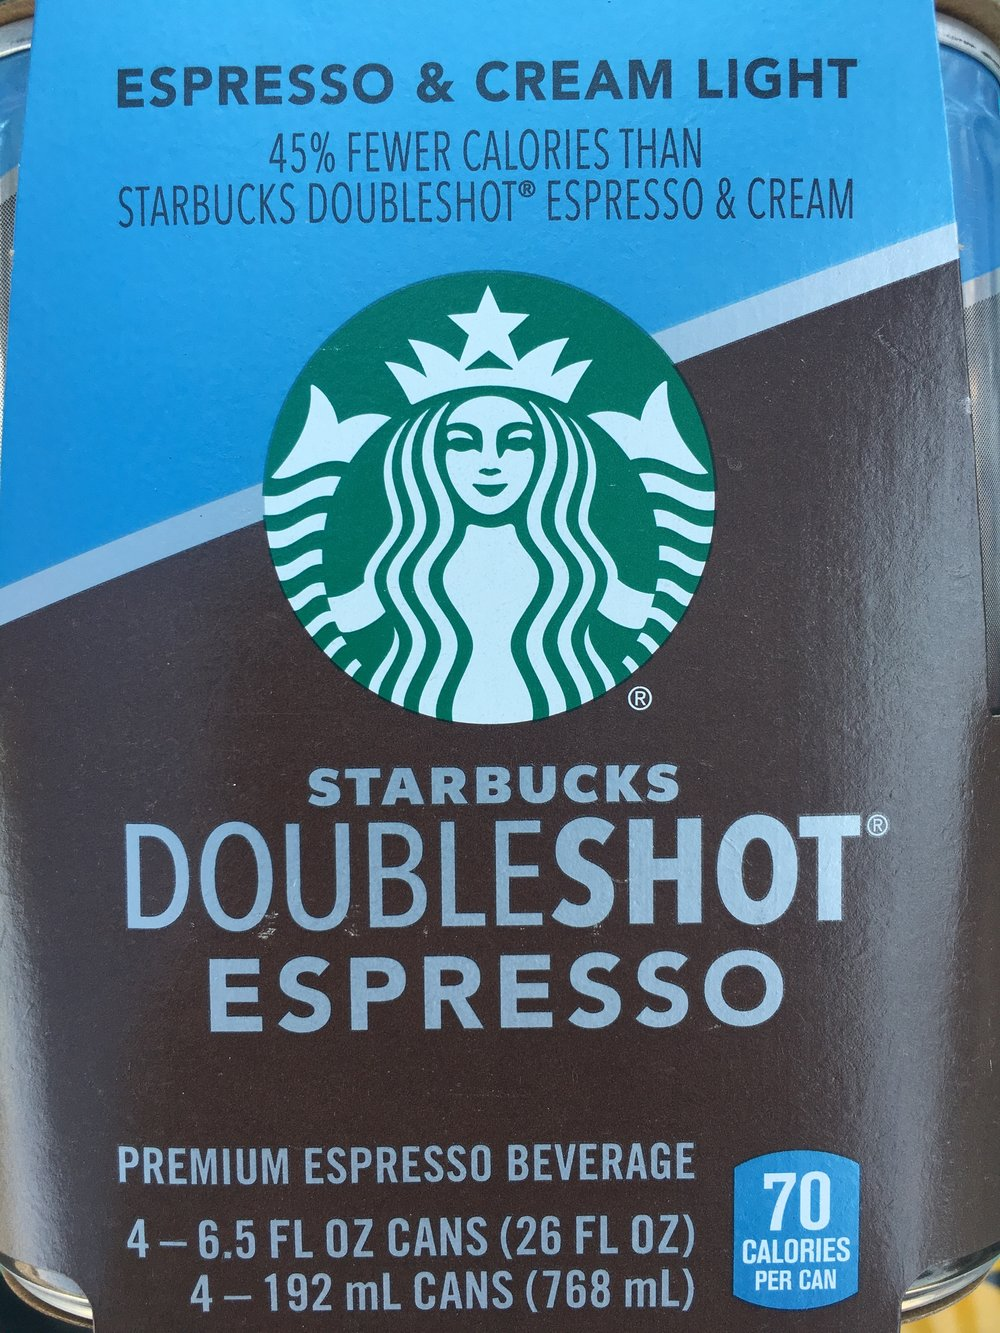 Starbucks - Doubleshot (Espresso & Cream Light)